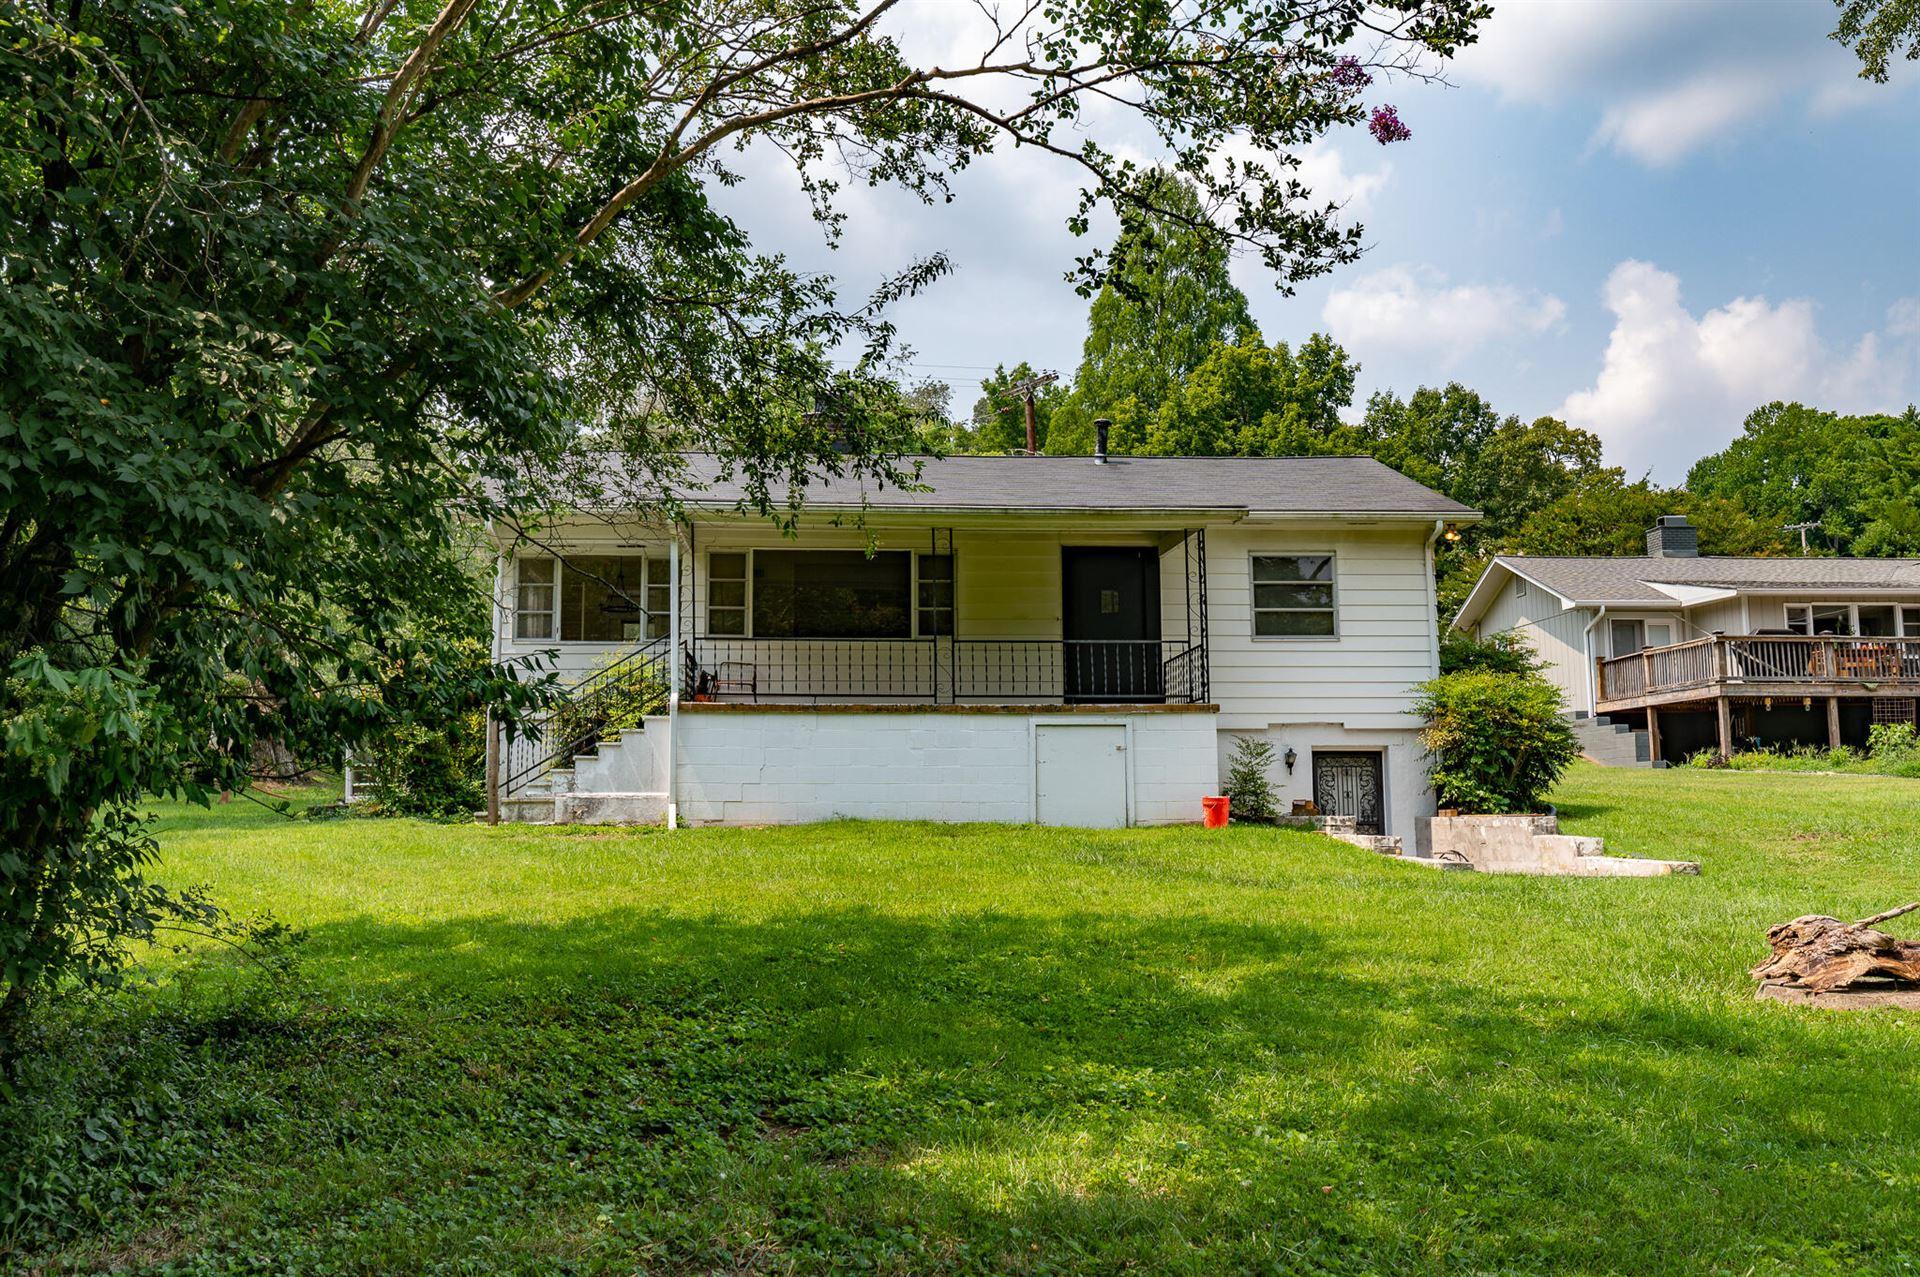 Photo of 128 California Ave, Oak Ridge, TN 37830 (MLS # 1161299)